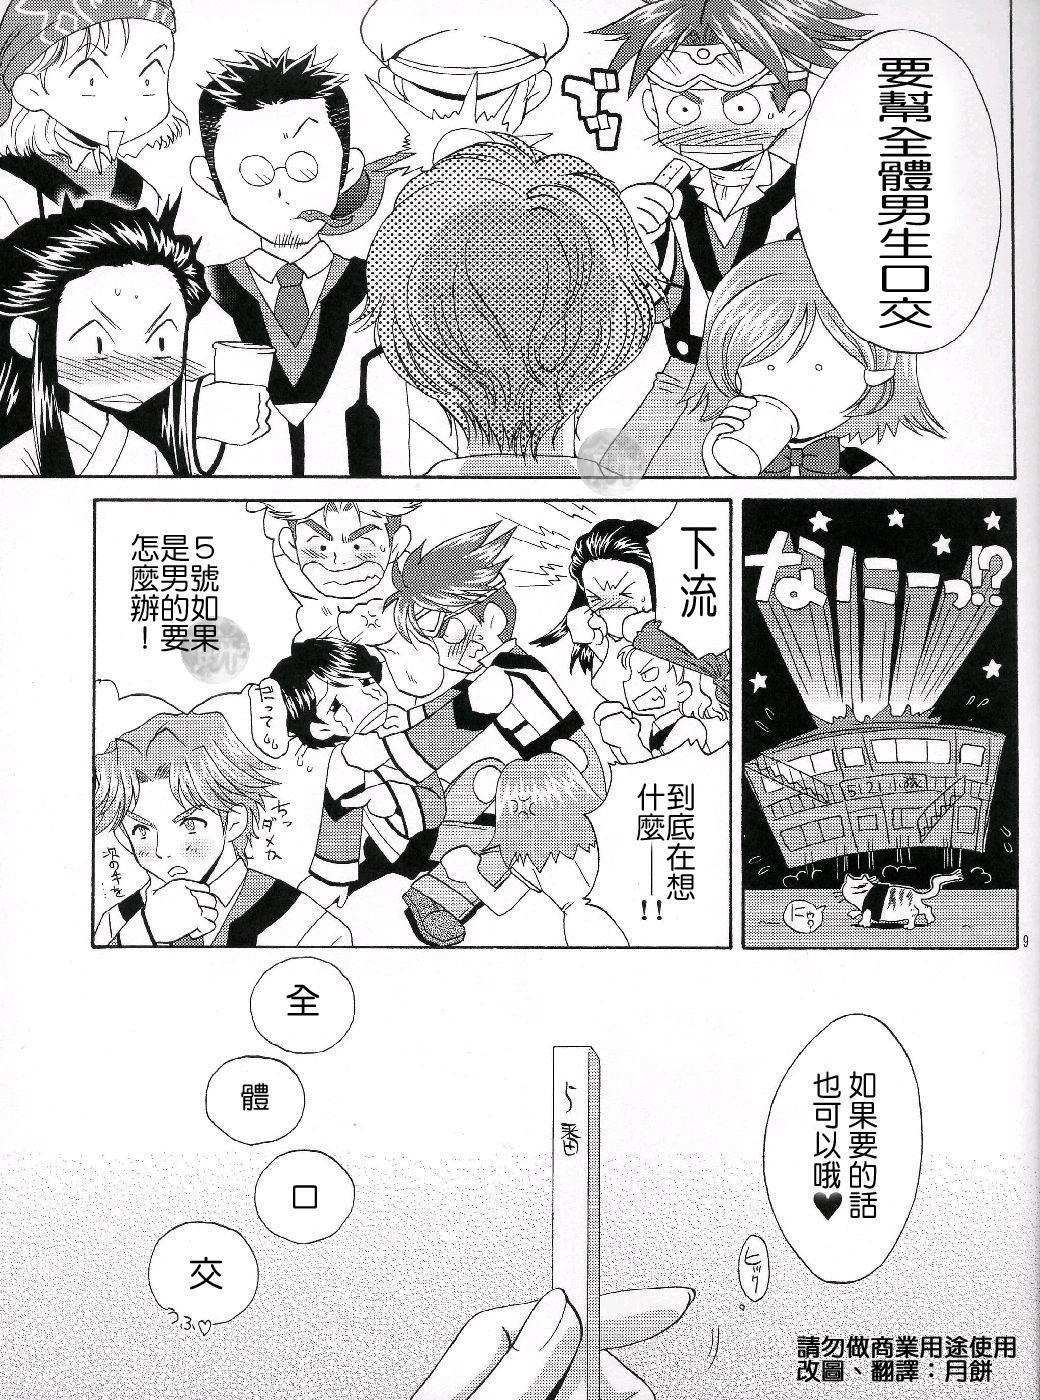 Hakudakueki Gensou Gang Bang March 7